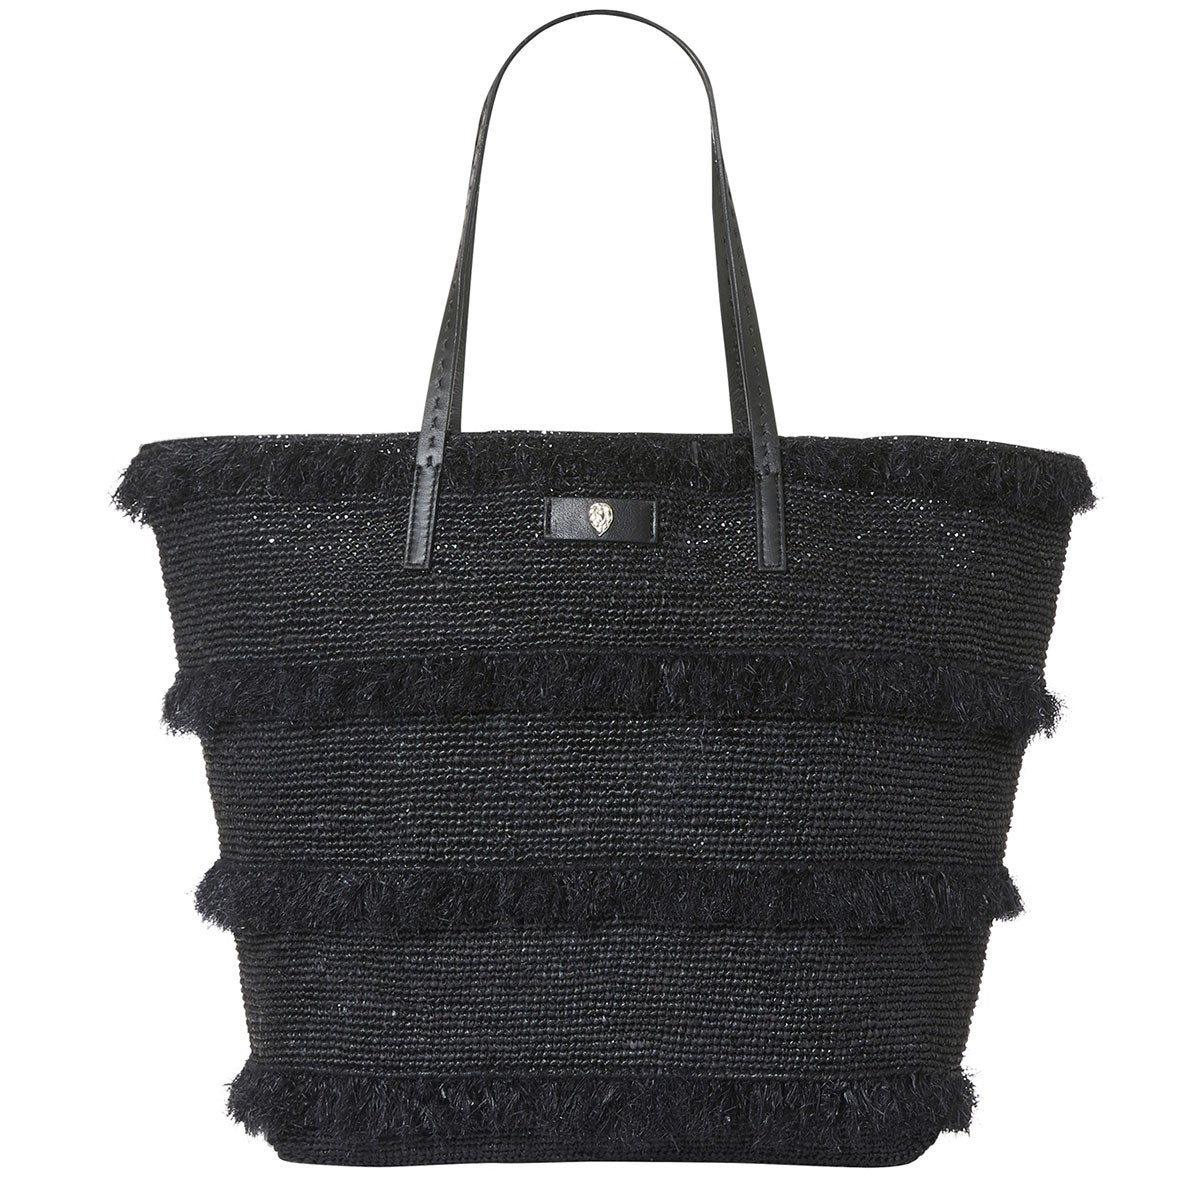 Helen Kaminski Davoletta Medium Fringe Basket in Charcoal,Black